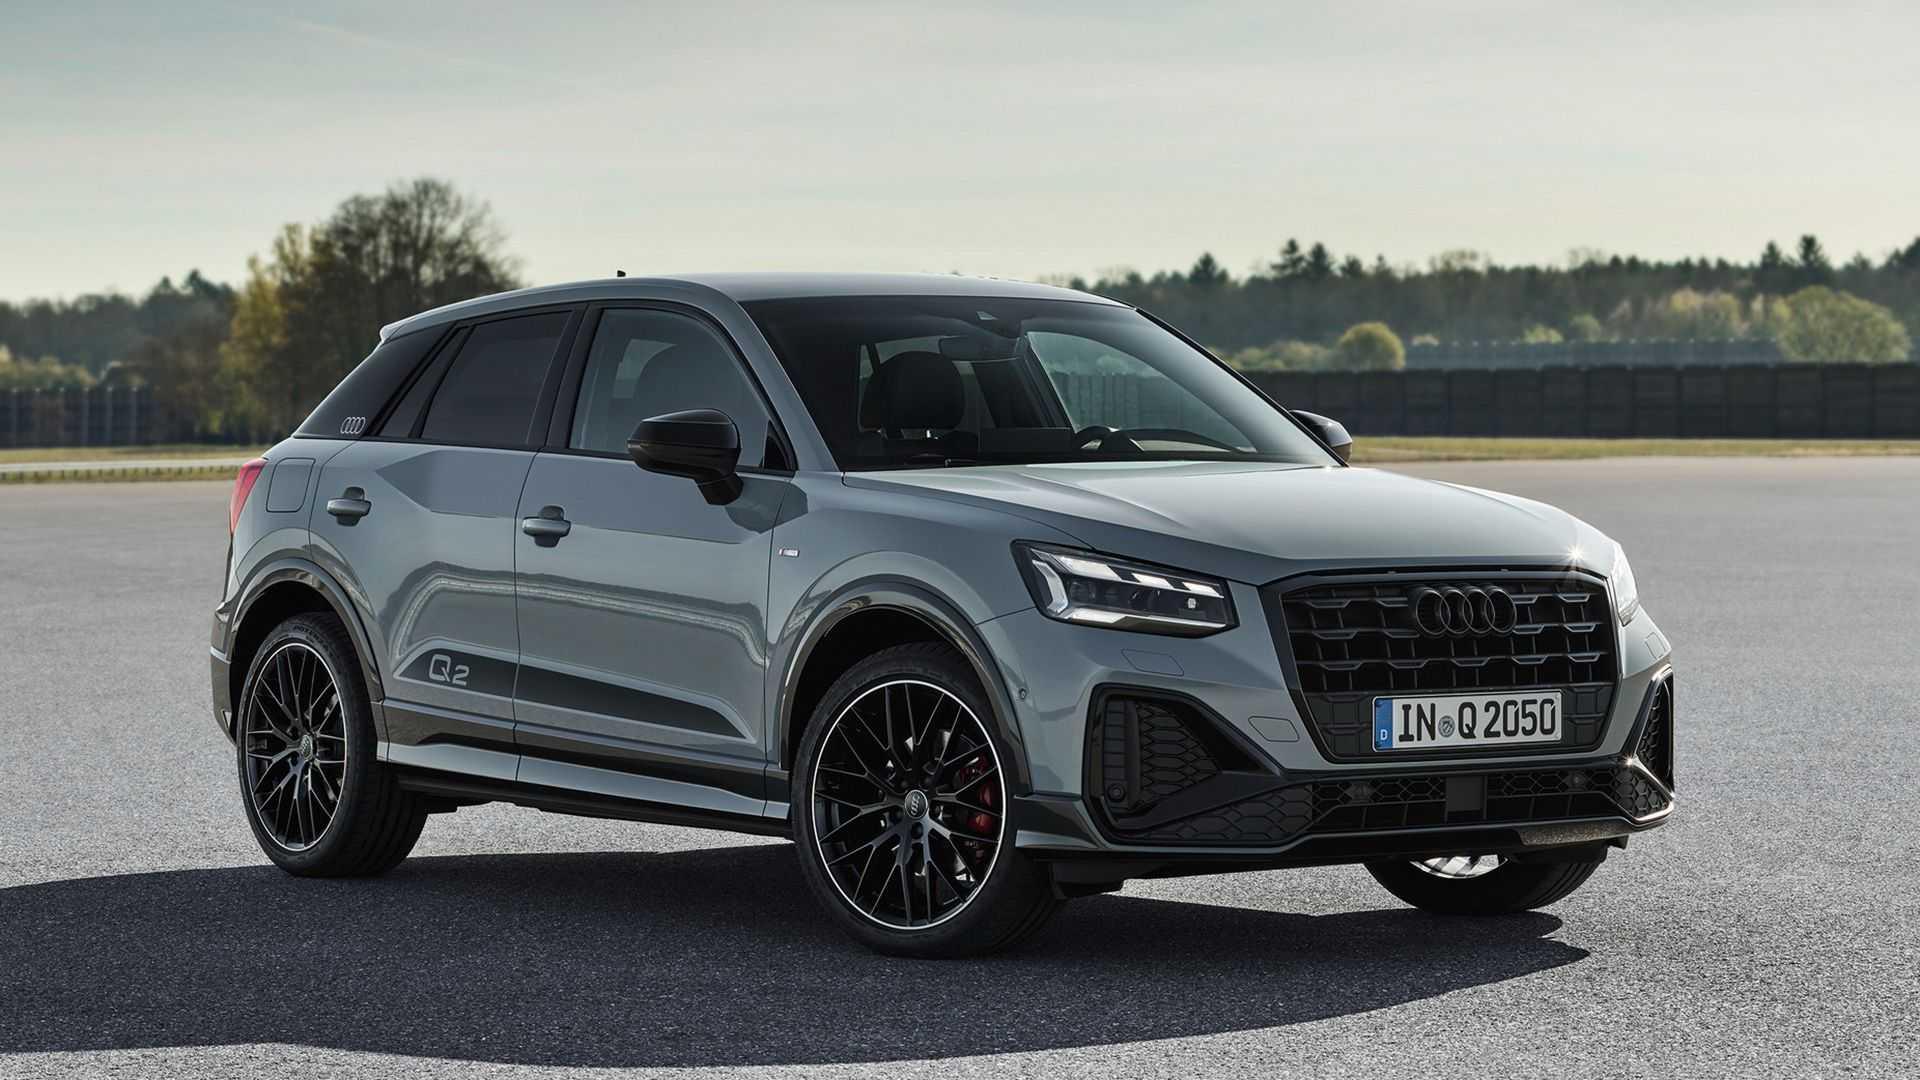 Audi Q2 (2021) face lift